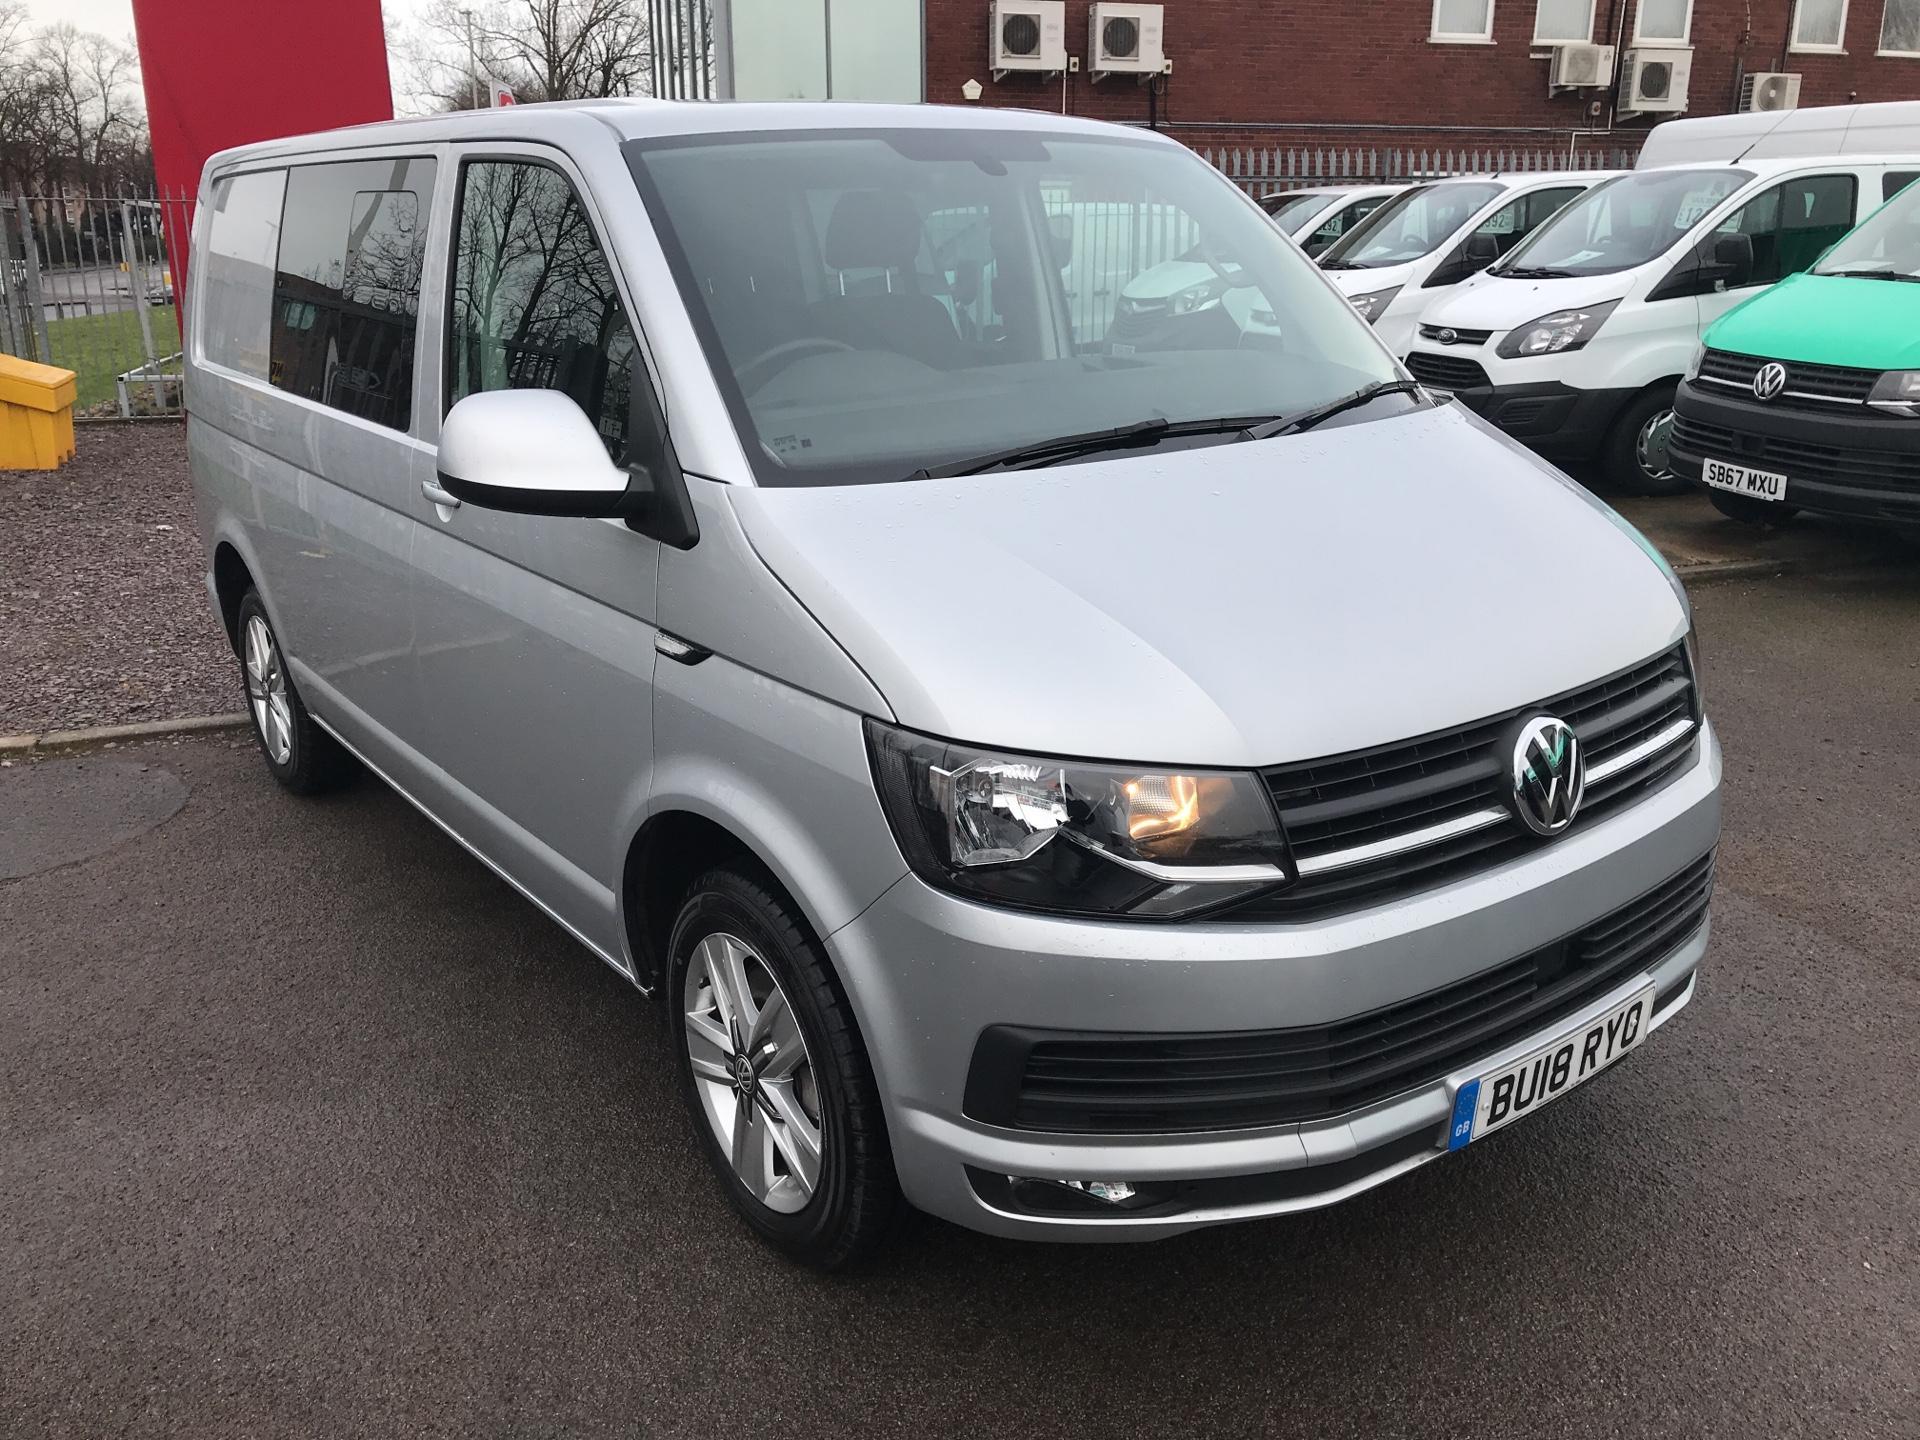 2018 Volkswagen Transporter T32 SWB DIESEL 2.0 TDI BMT 150 HIGHLINE COMBI VAN EURO 6  (BU18RYO)